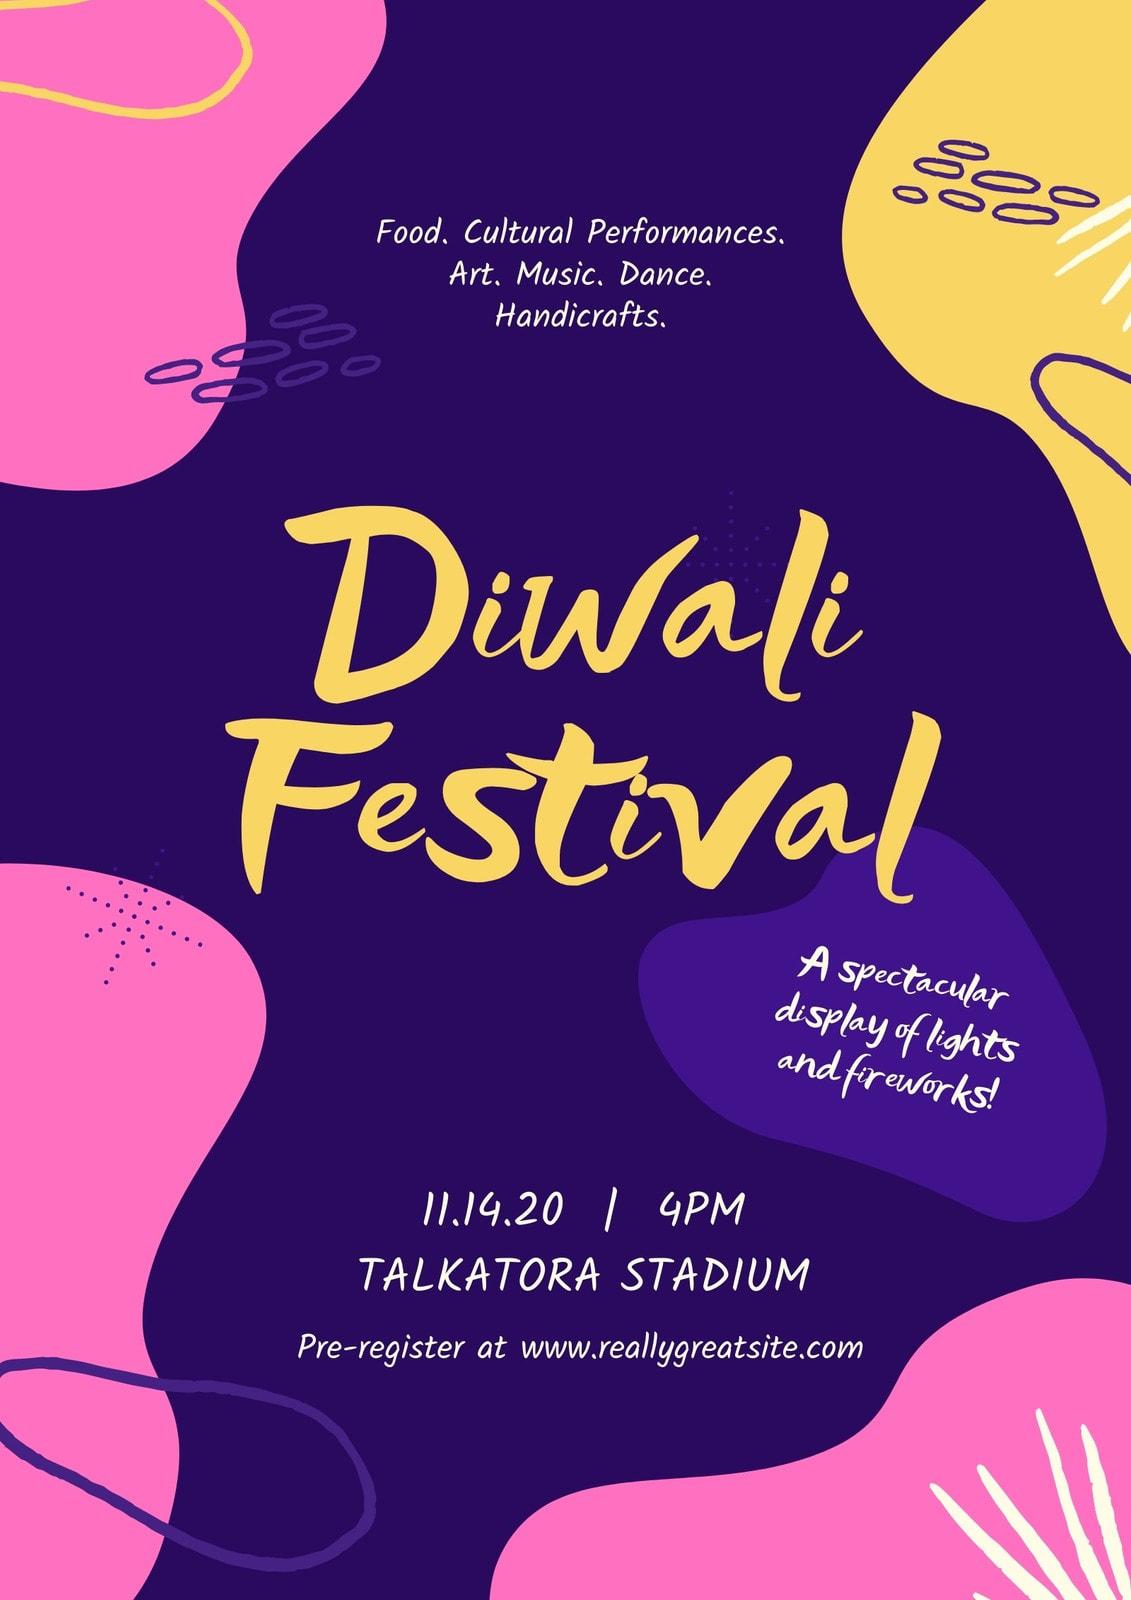 Indigo, Pink, and Yellow Blobs Illustrated Diwali Folded Card